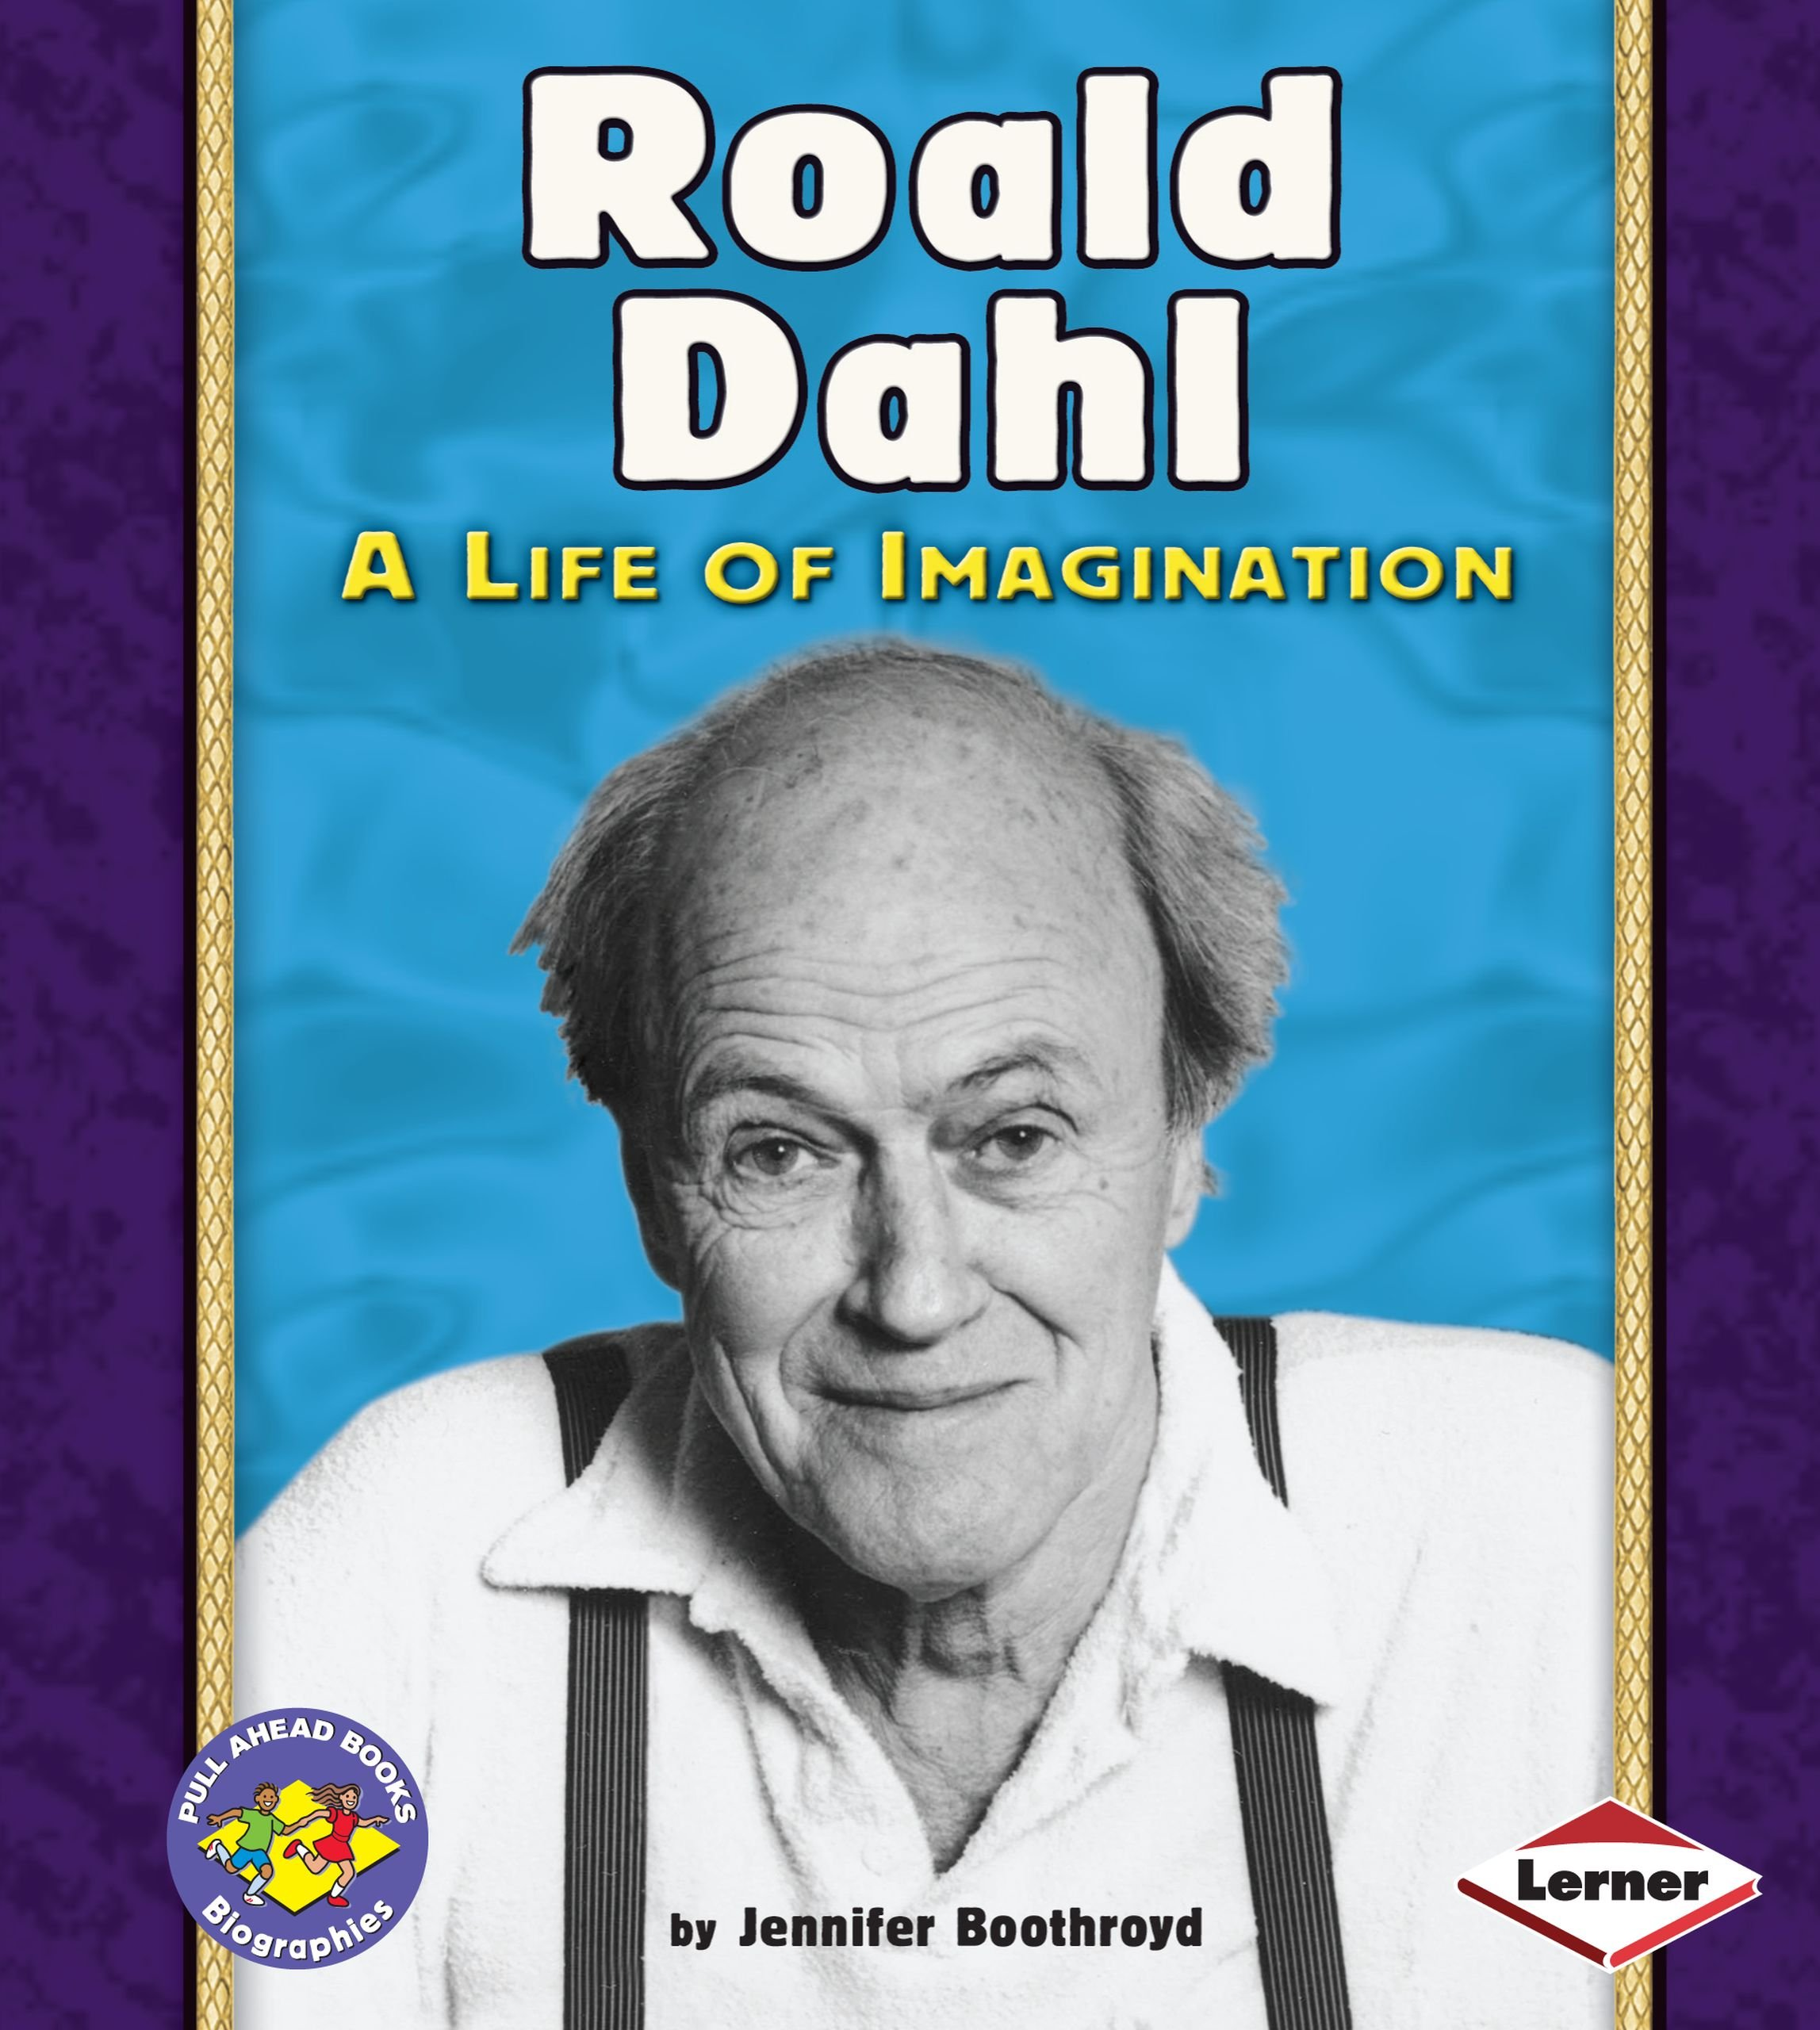 Roald Dahl: A Life of Imagination (Pull Ahead Books: Biographies) ebook